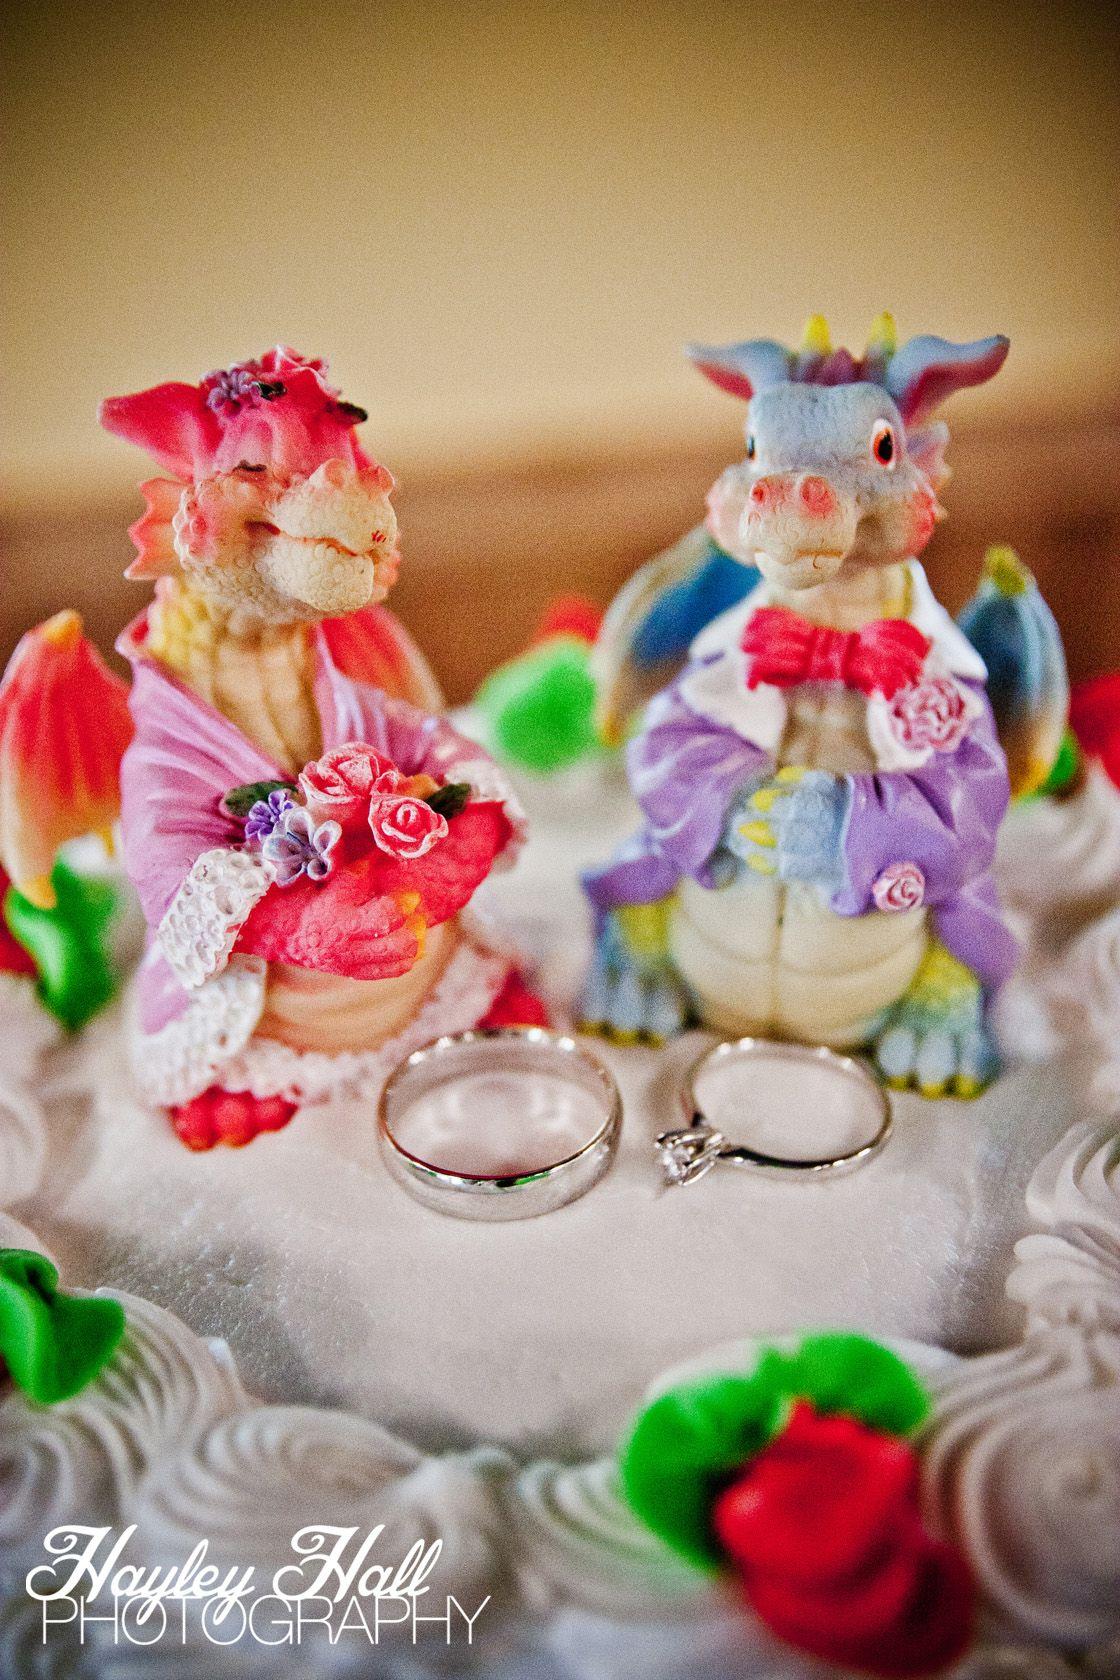 Tyler Texas Wedding Photography Cake Cute Topper Rings